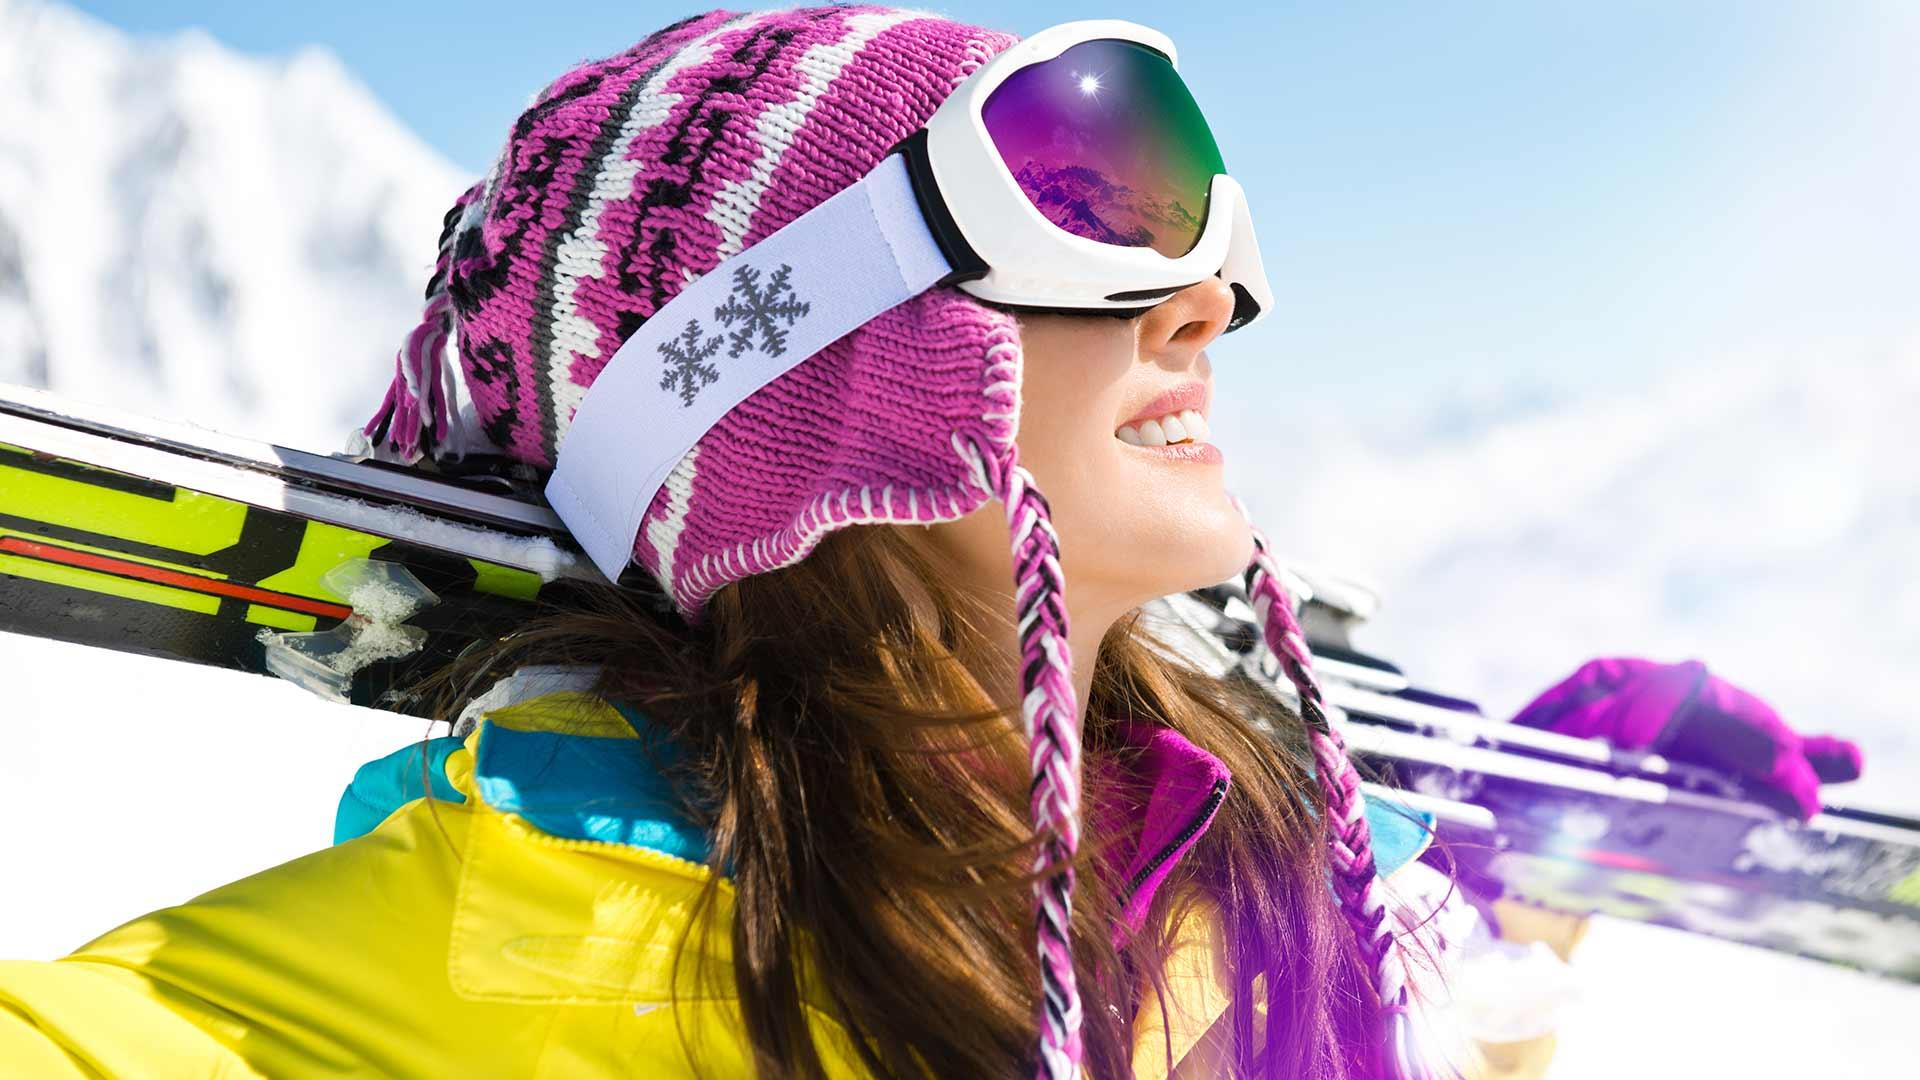 Sonne genießen - Skiurlaub